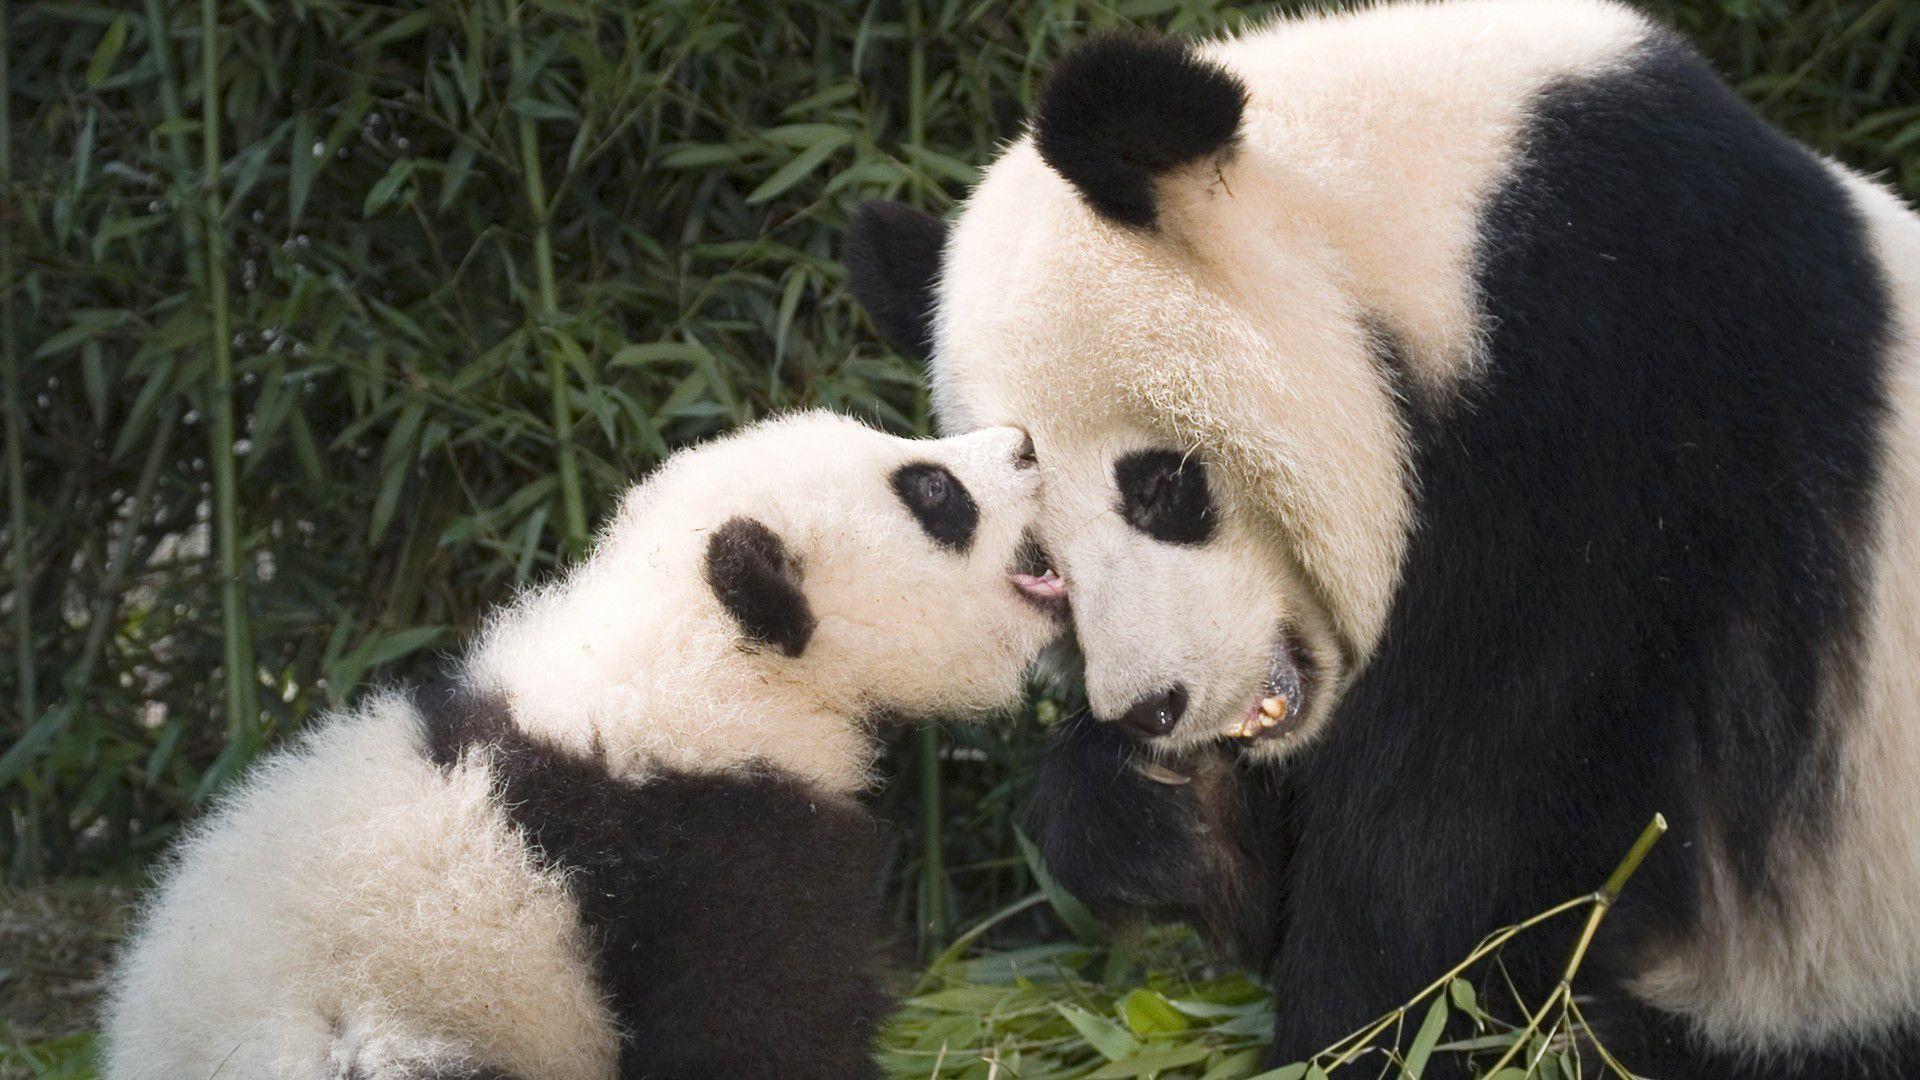 Panda and baby panda Wallpaper HD Wallpapers – Panda and baby .